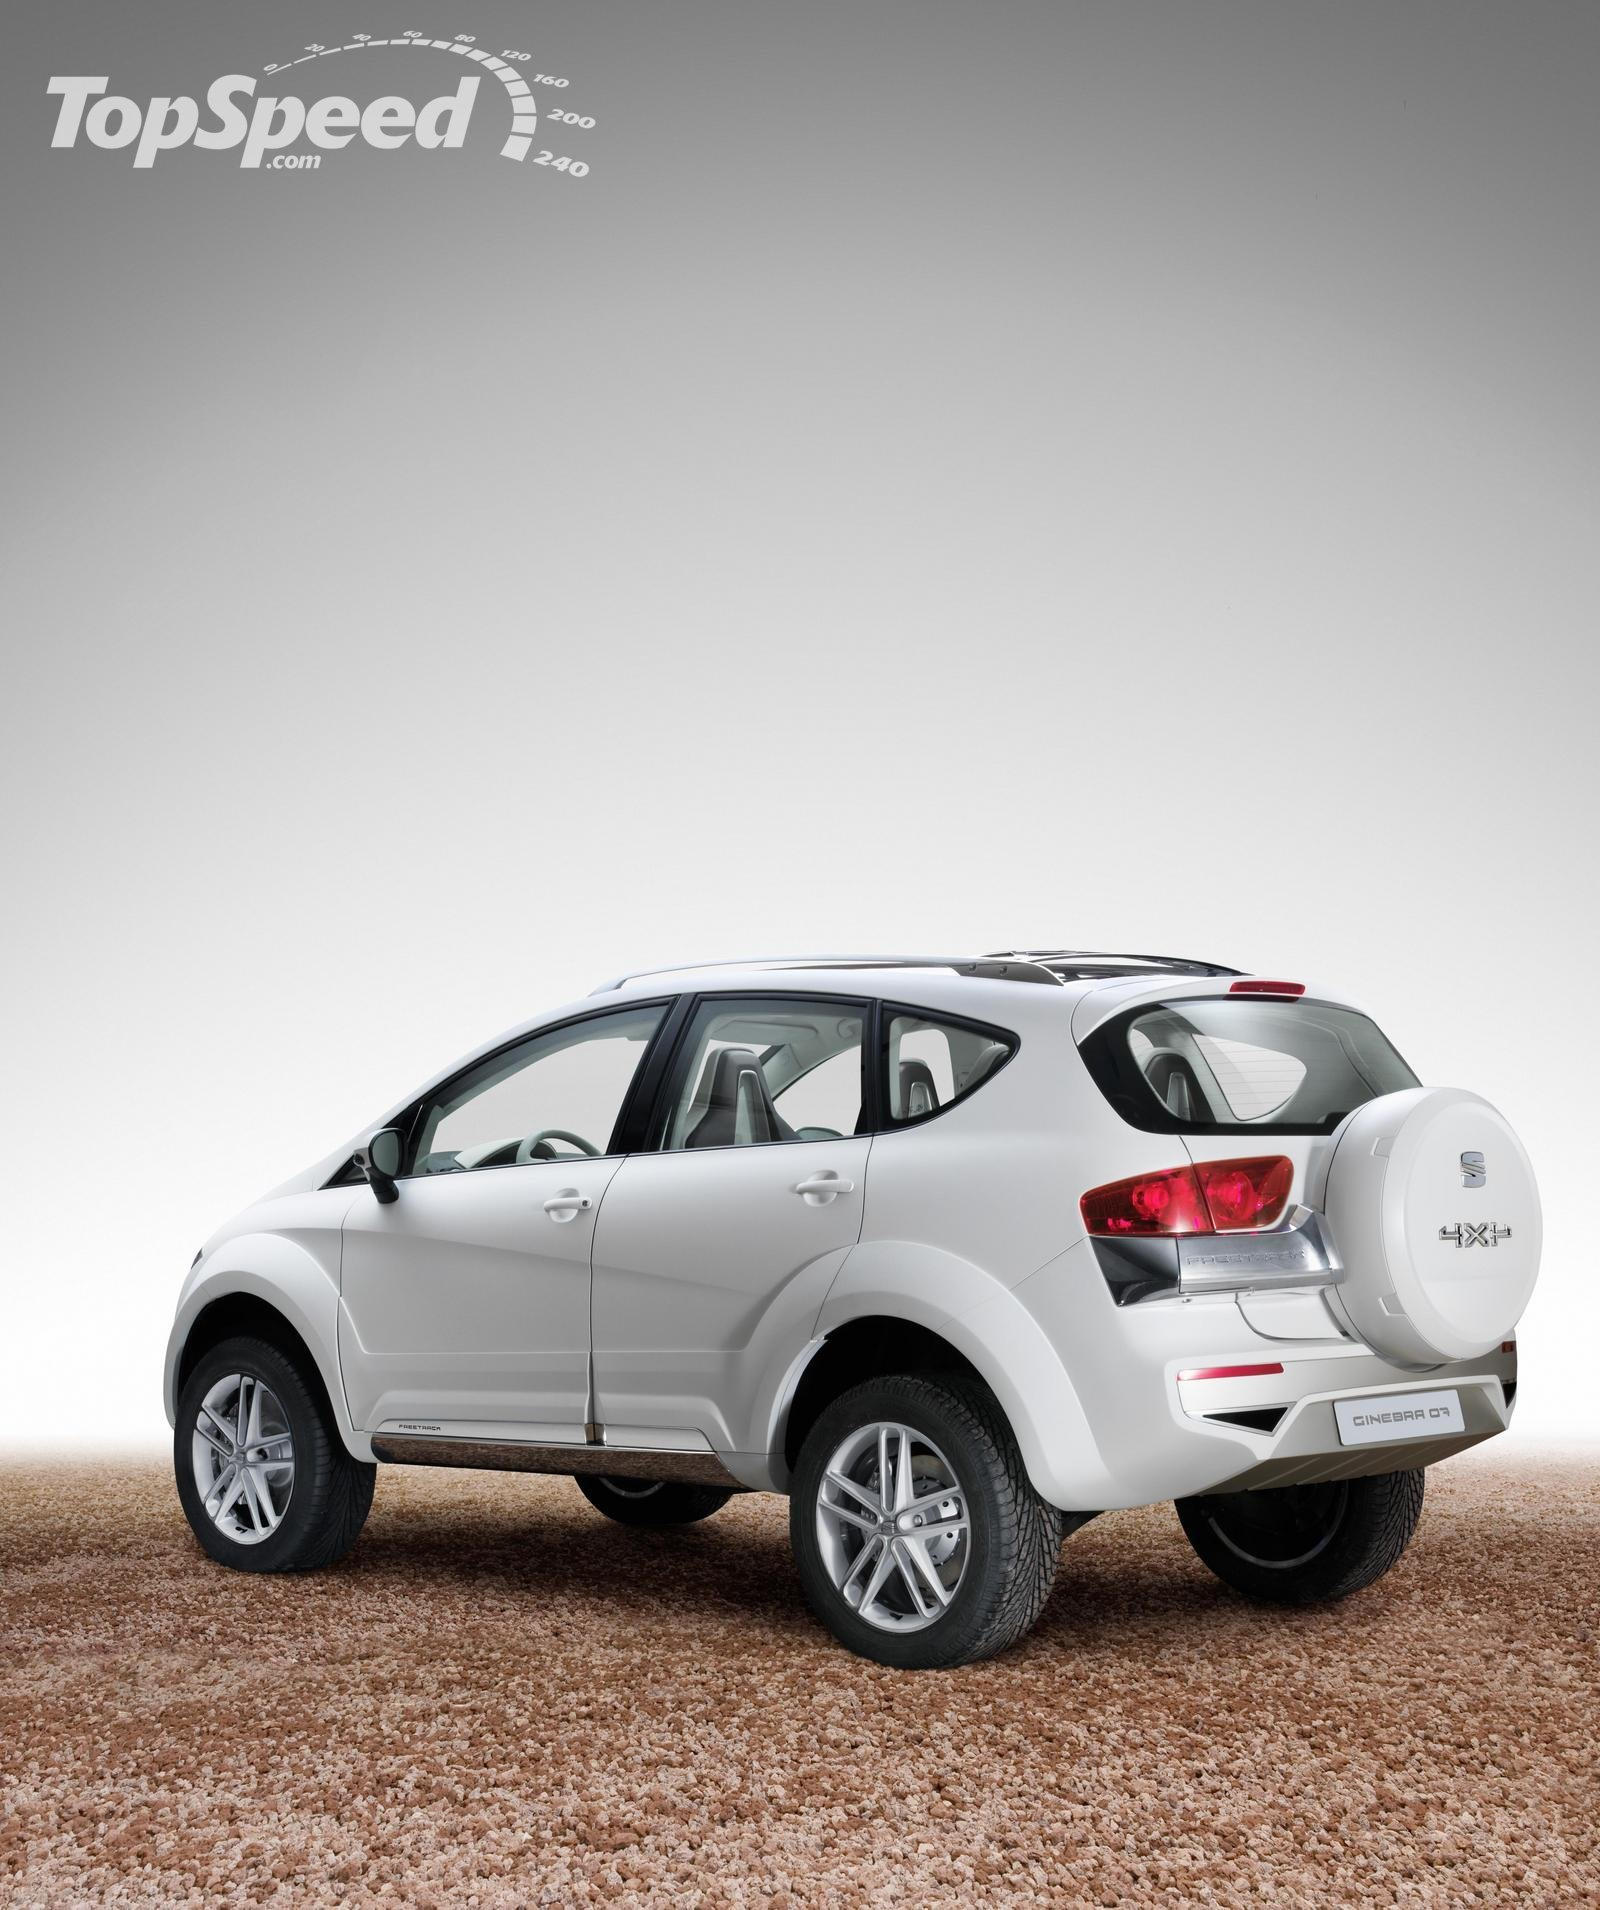 SEAT Altea Freetrack 2.0 TDI 170 PS DPF 4WD auto technische daten ...